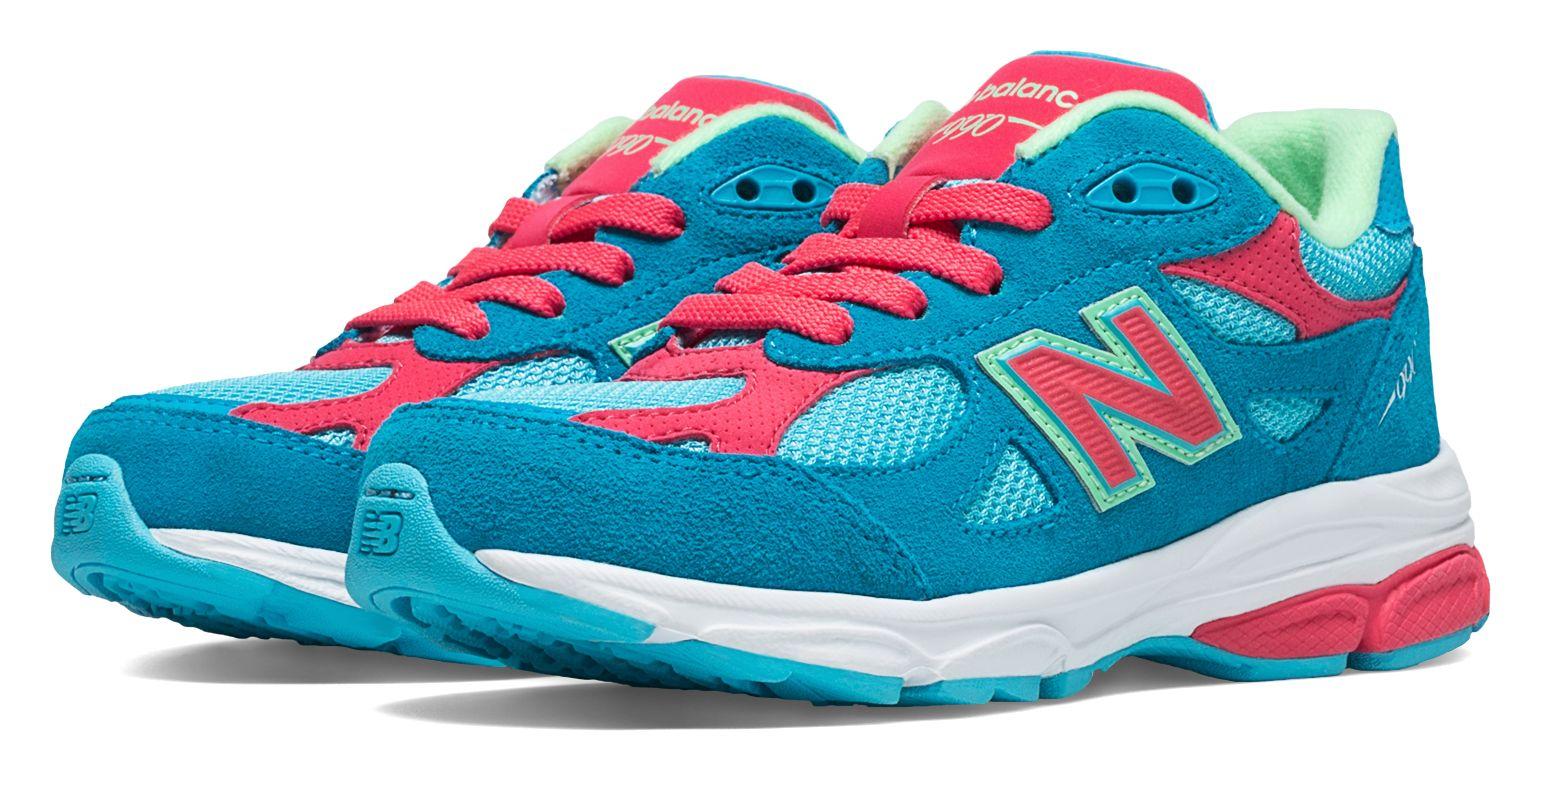 New Balance Kids Sportista 990v 3 Shoes Blue